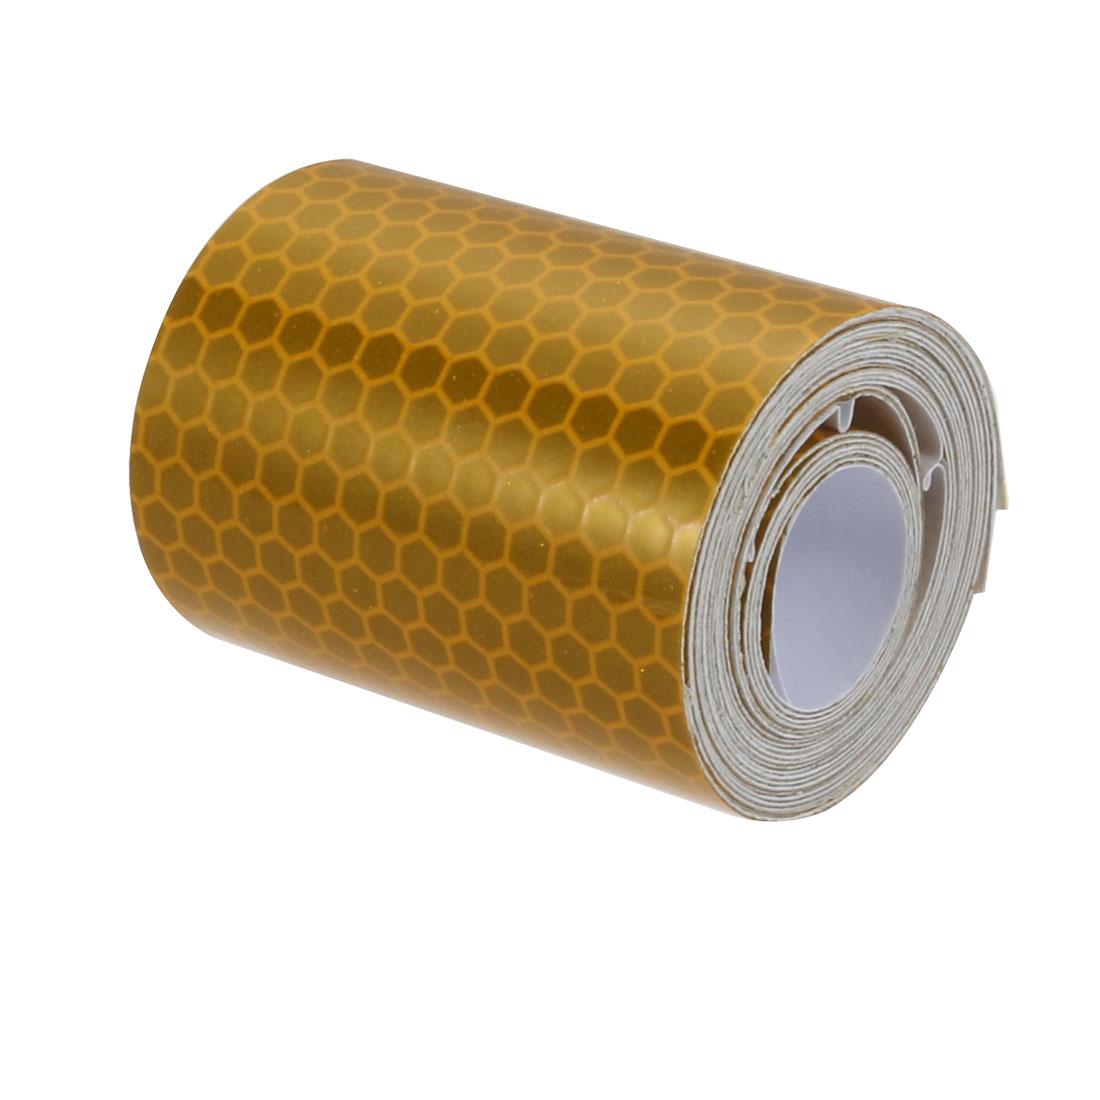 5cm Width 2Meter Length Honeycomb Adhesive Reflective Warning Tape Yellow